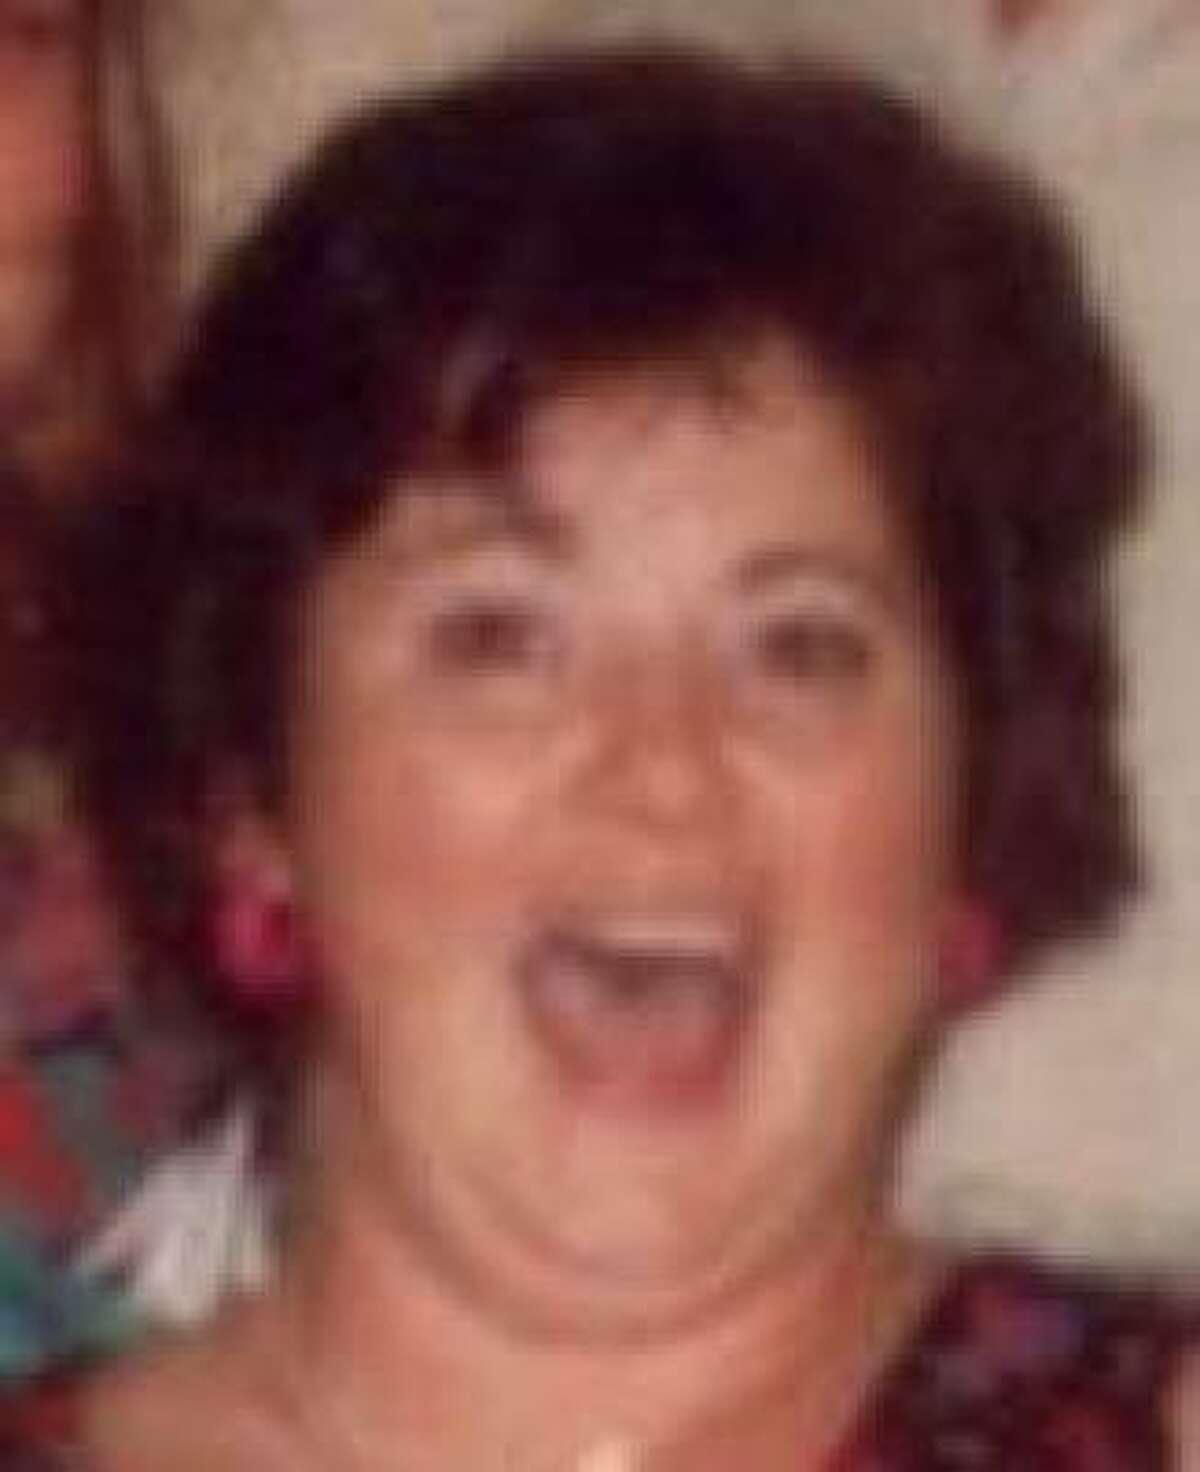 Deborah Applegate was a 46-year-old mother of three.